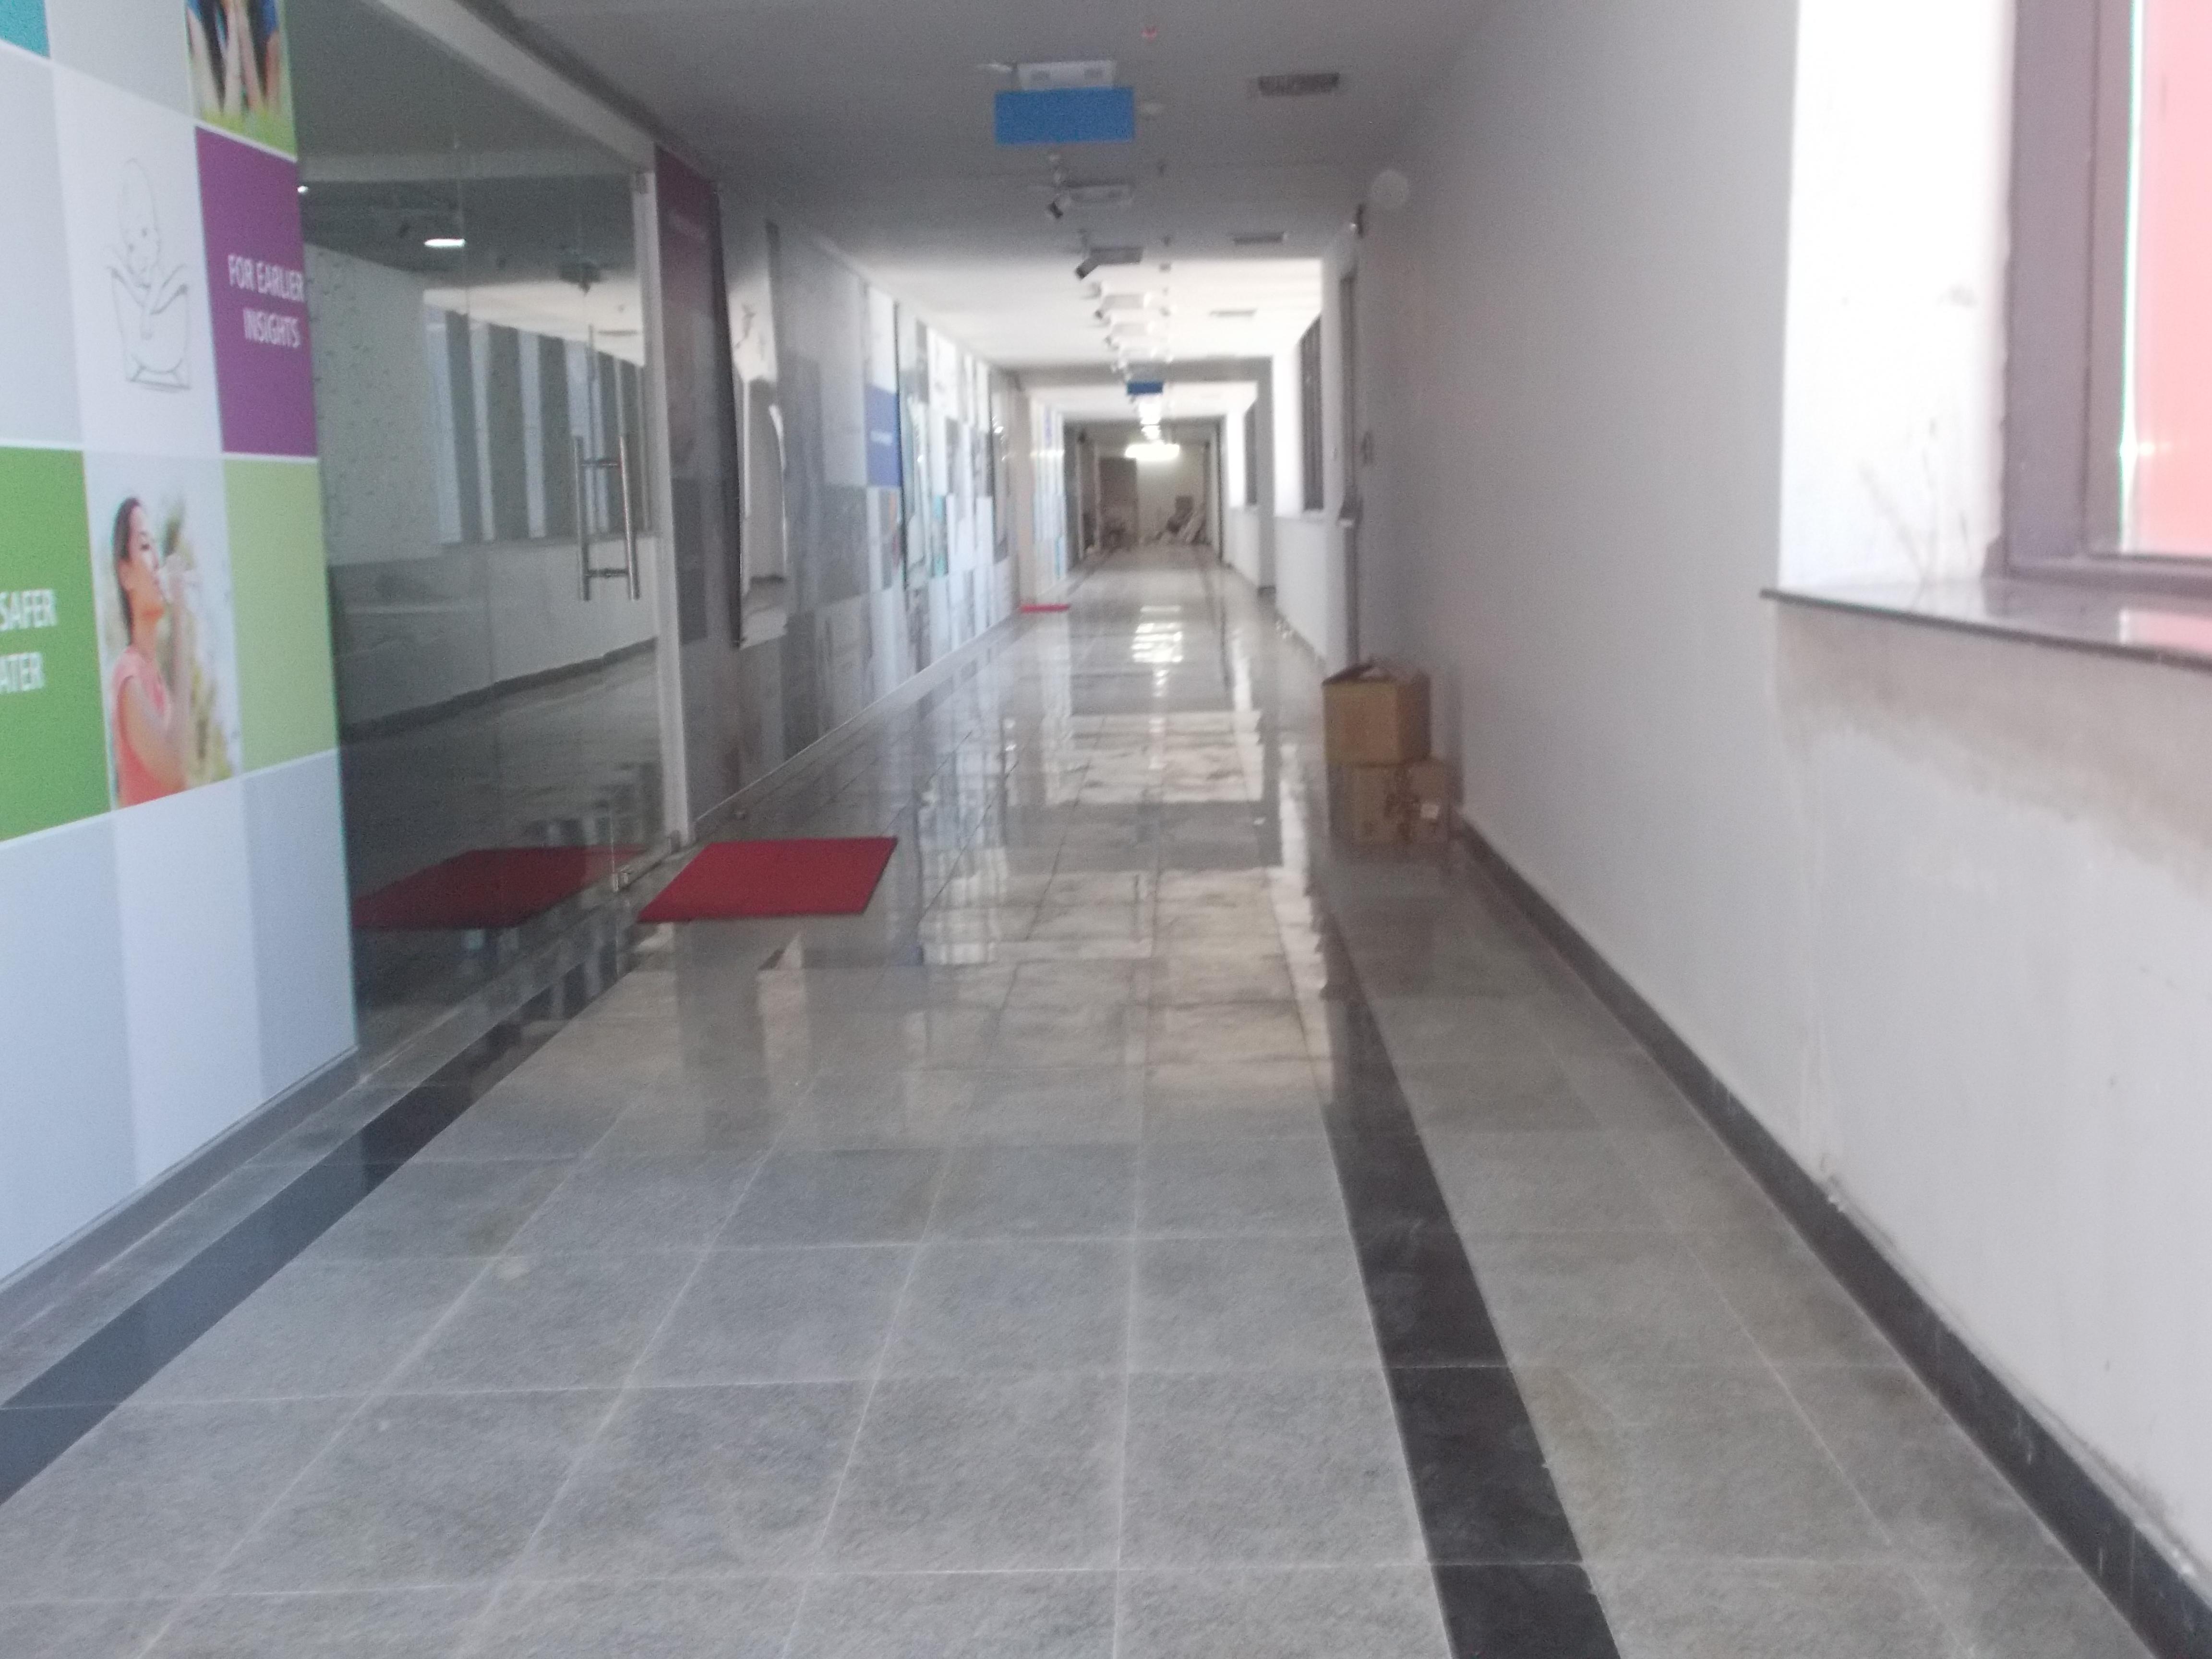 10. Corridor granite tile flooring